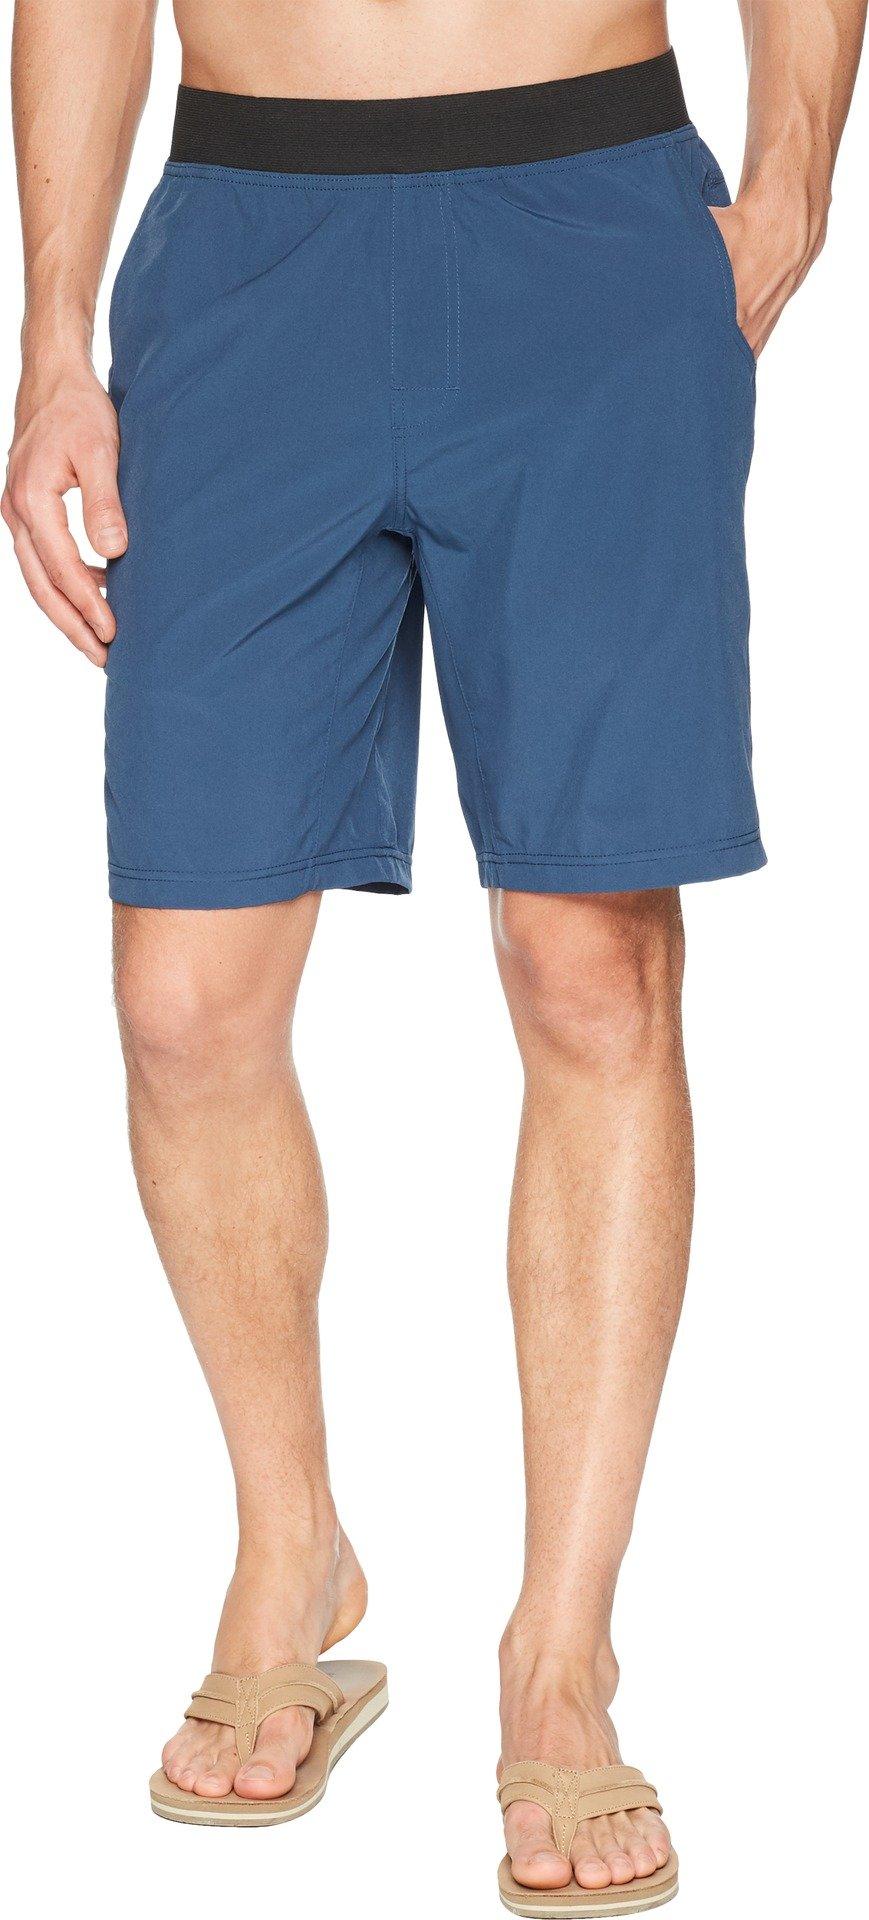 prAna Men's Super Mojo Shorts, XX-Large, Equinox Blue by prAna (Image #1)